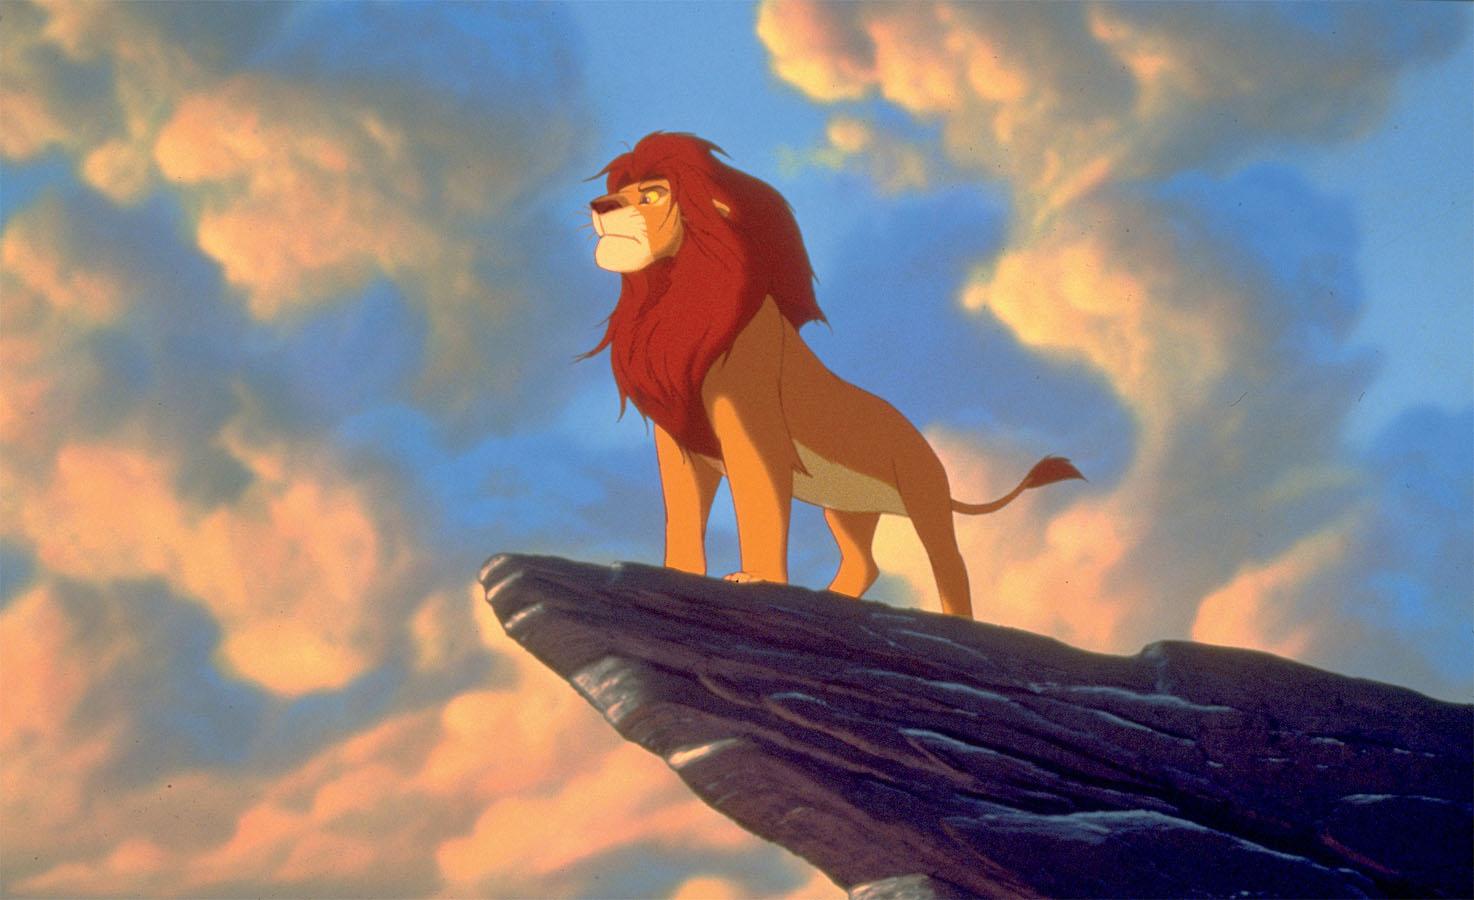 http://3.bp.blogspot.com/-sr8Y56GHZdw/TujsyMVsgTI/AAAAAAAAHFI/ogoEB65rfsg/s1600/Lion_King.jpg